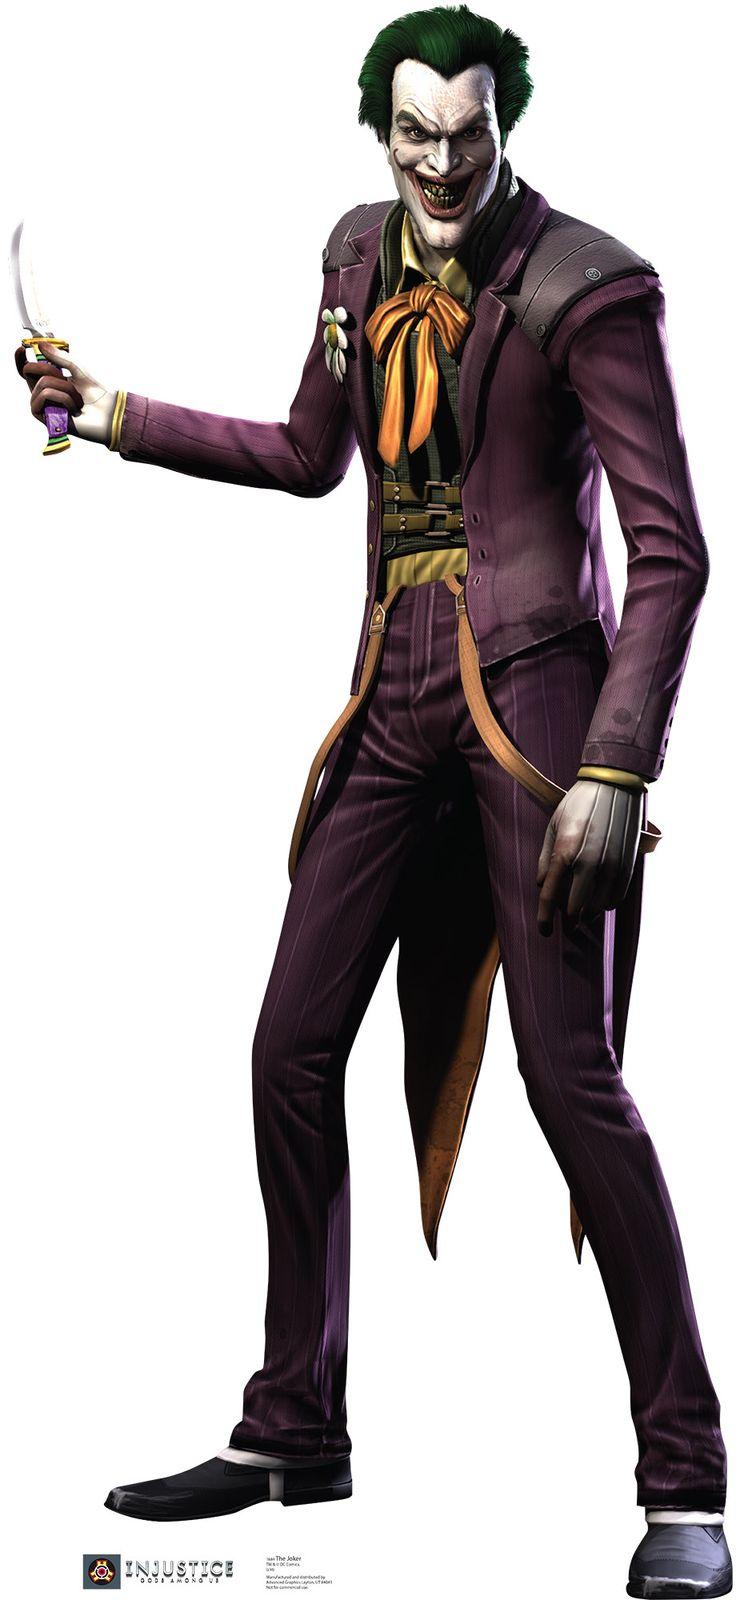 The Joker - Injustice DC Comics Game Cardboard Standup